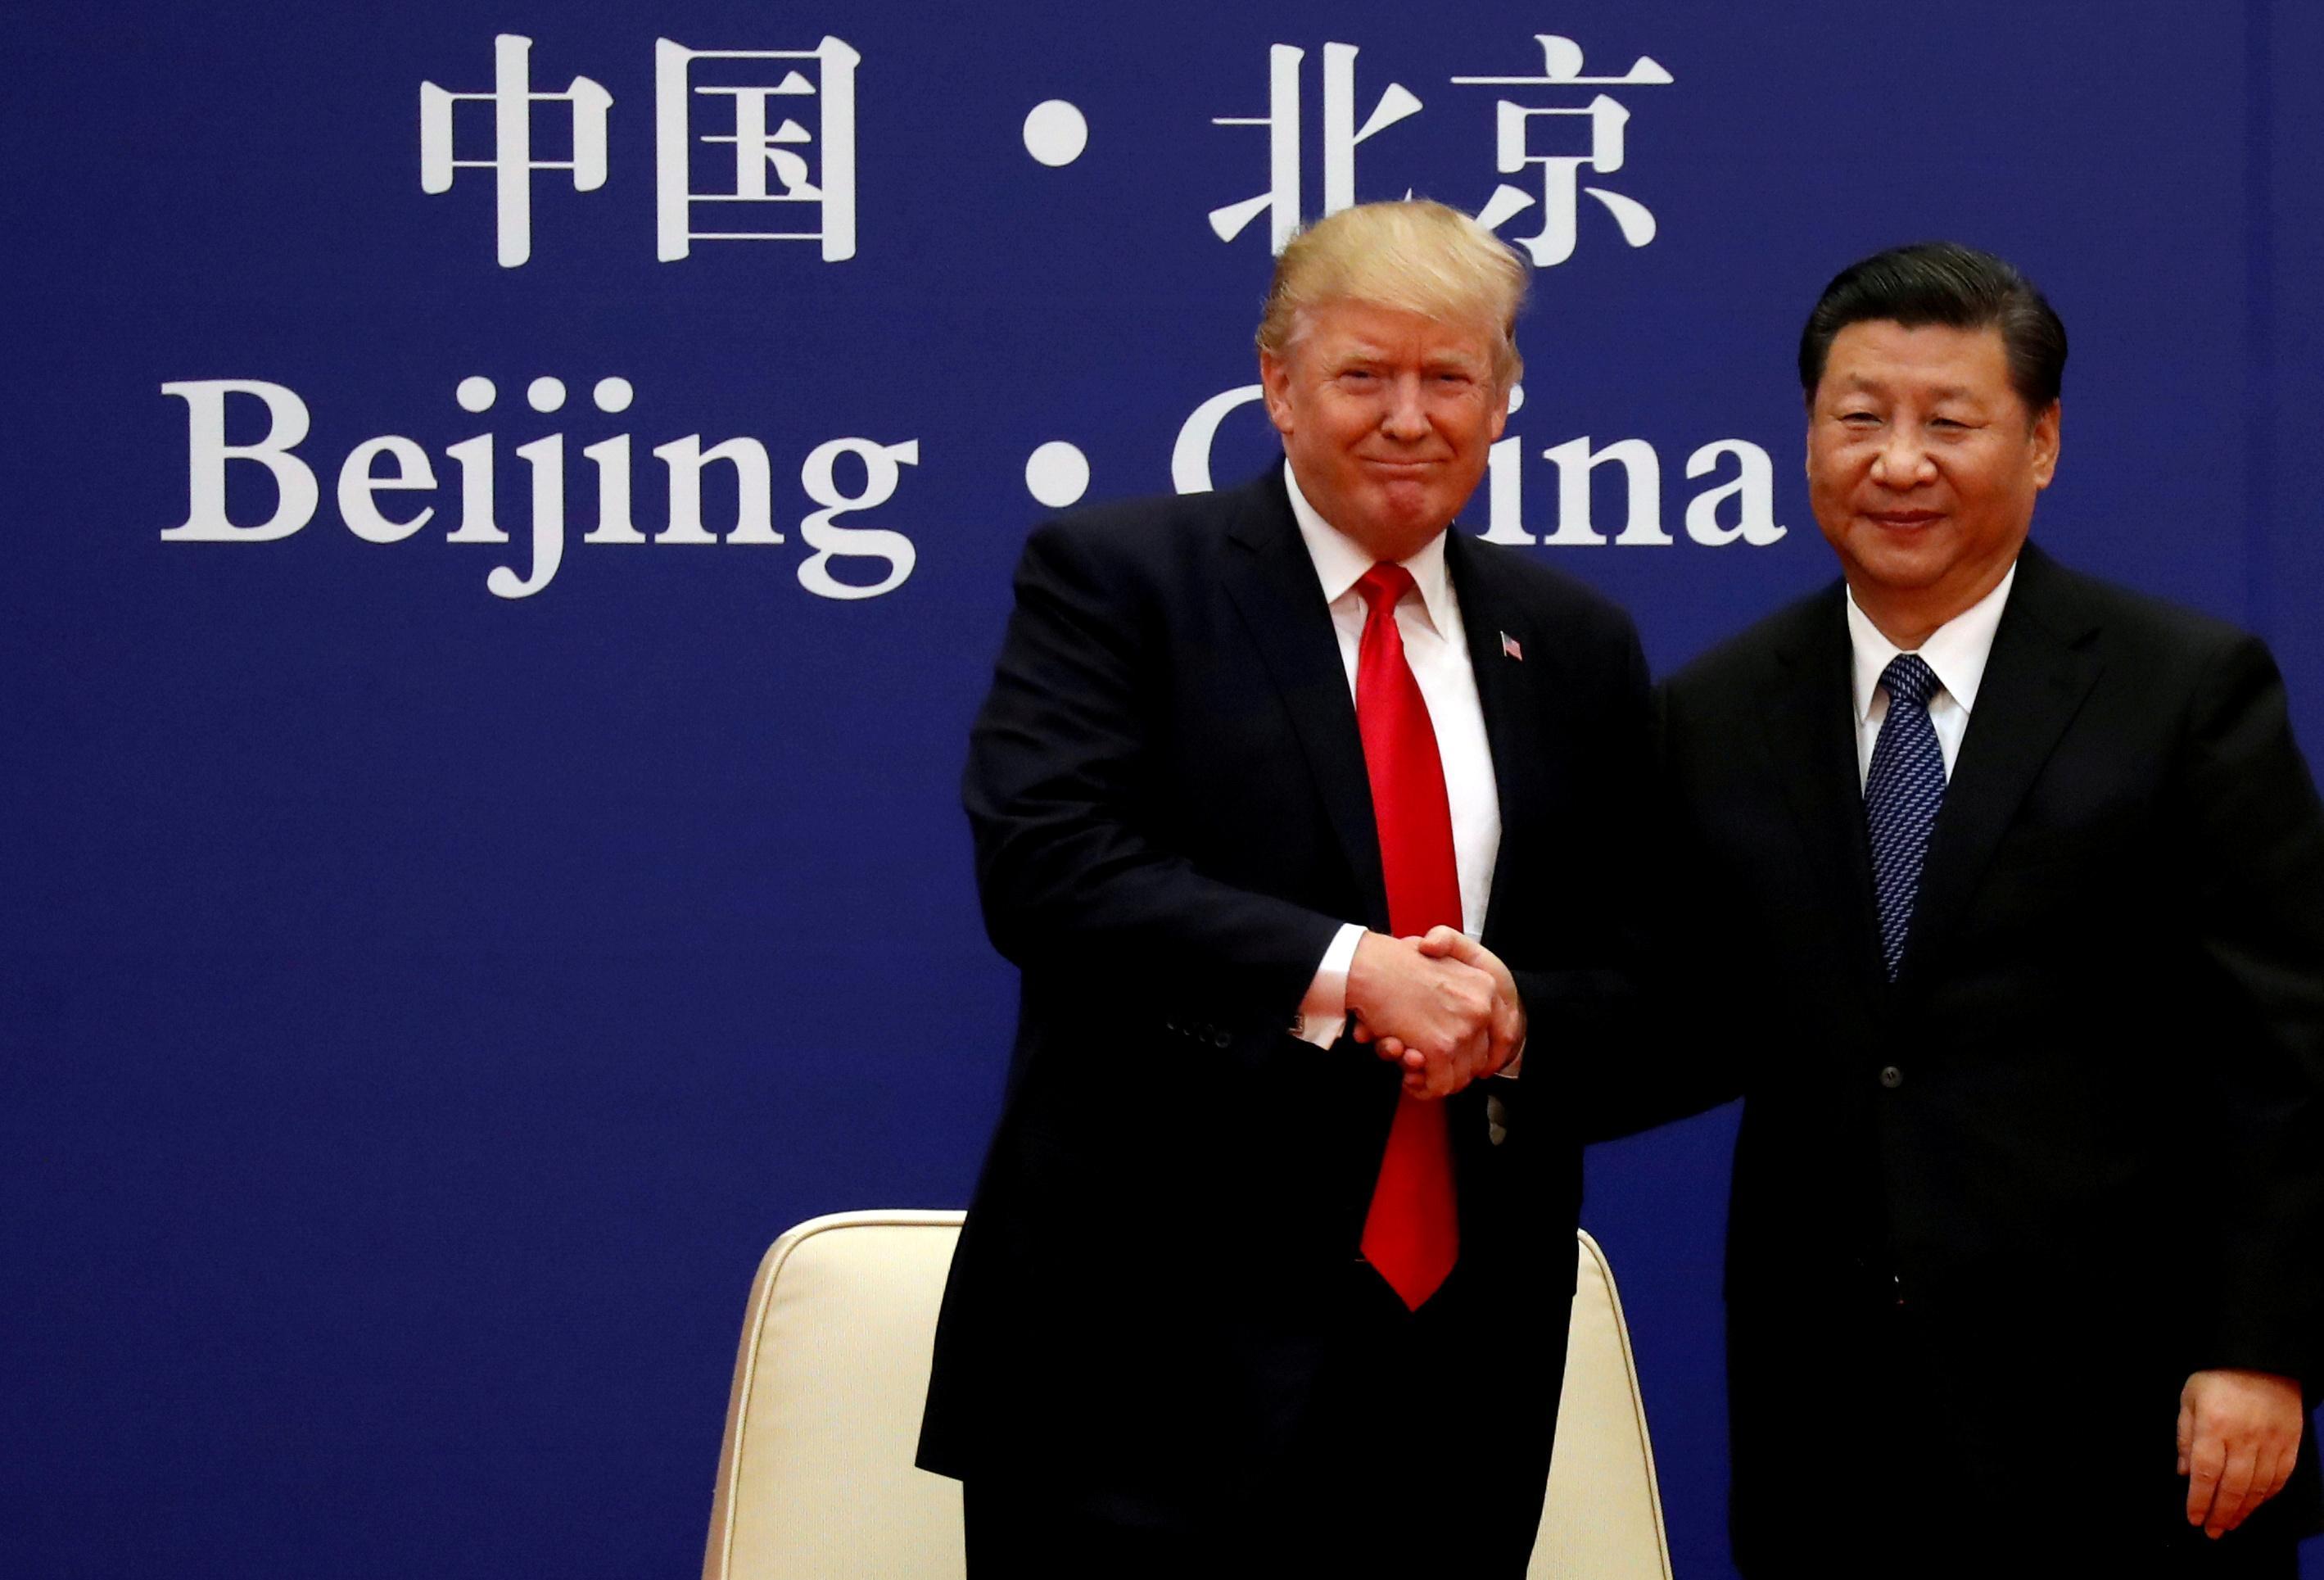 Trump 'Firm' on China Structural Demands, Tariffs Part of Enforcement - Pence